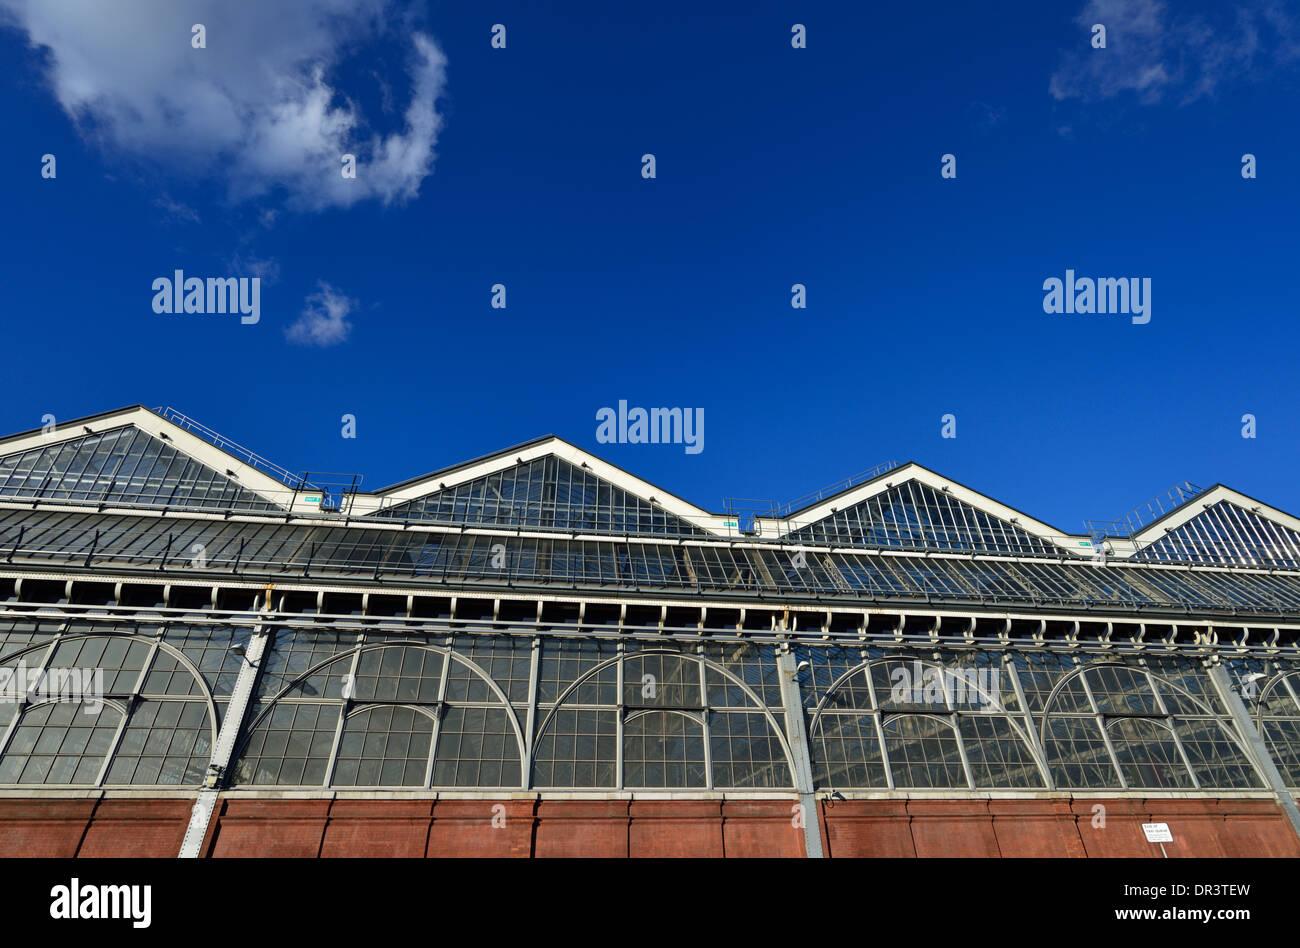 London Waterloo station,Waterloo Rd, London SE1, United Kingdom - Stock Image